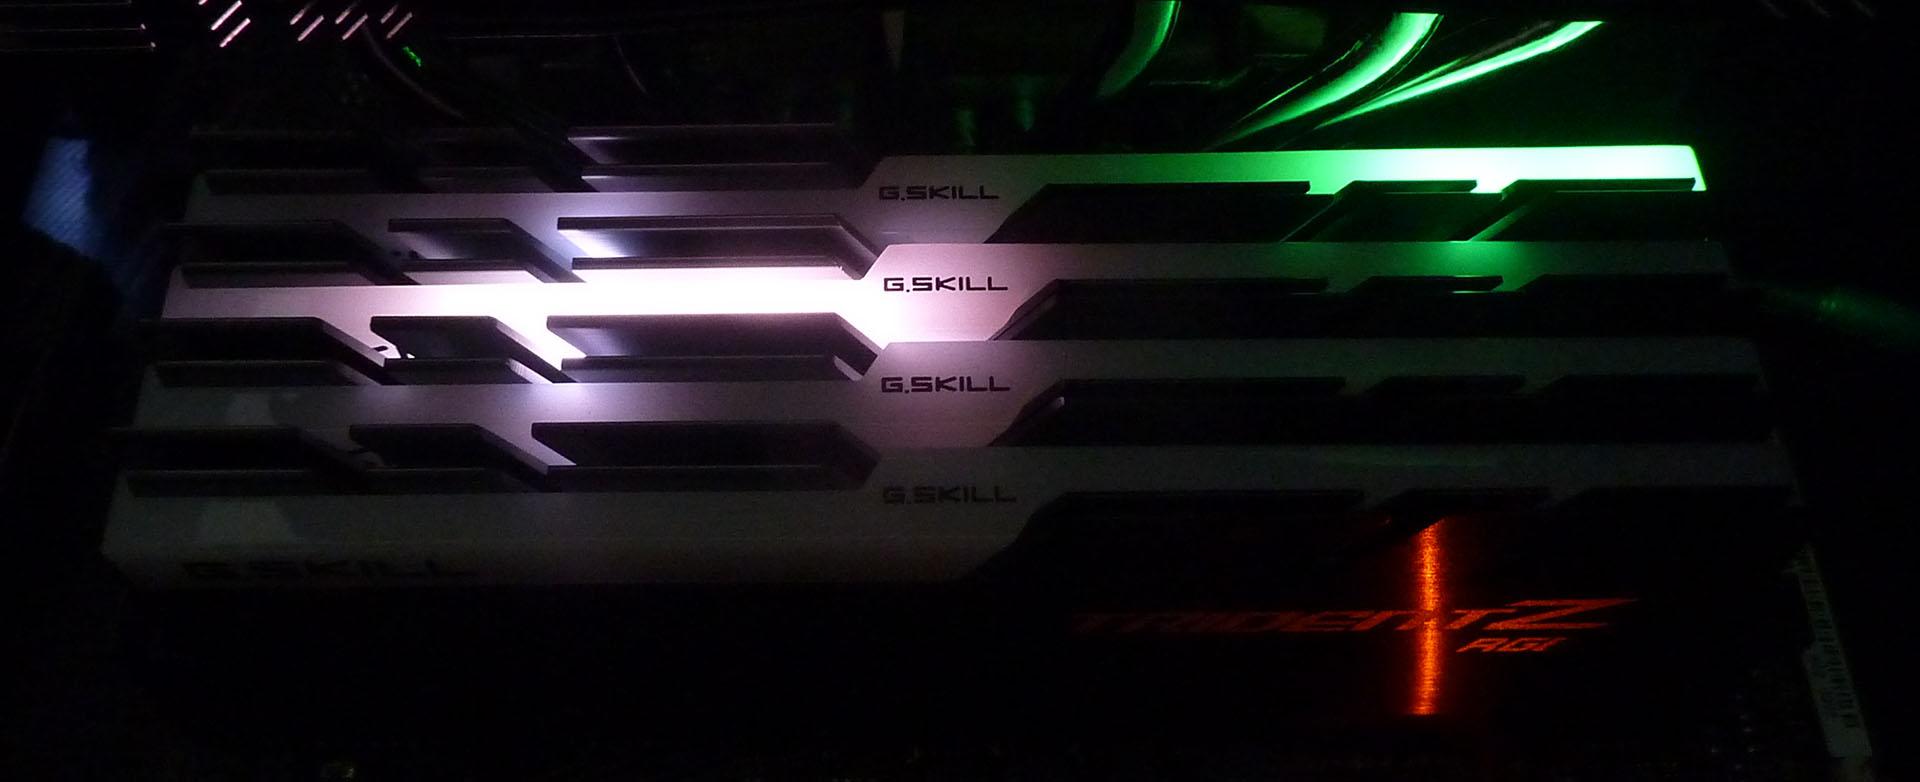 Review: G Skill Trident Z RGB 32GB DDR4-3200 (F4-3200C16Q